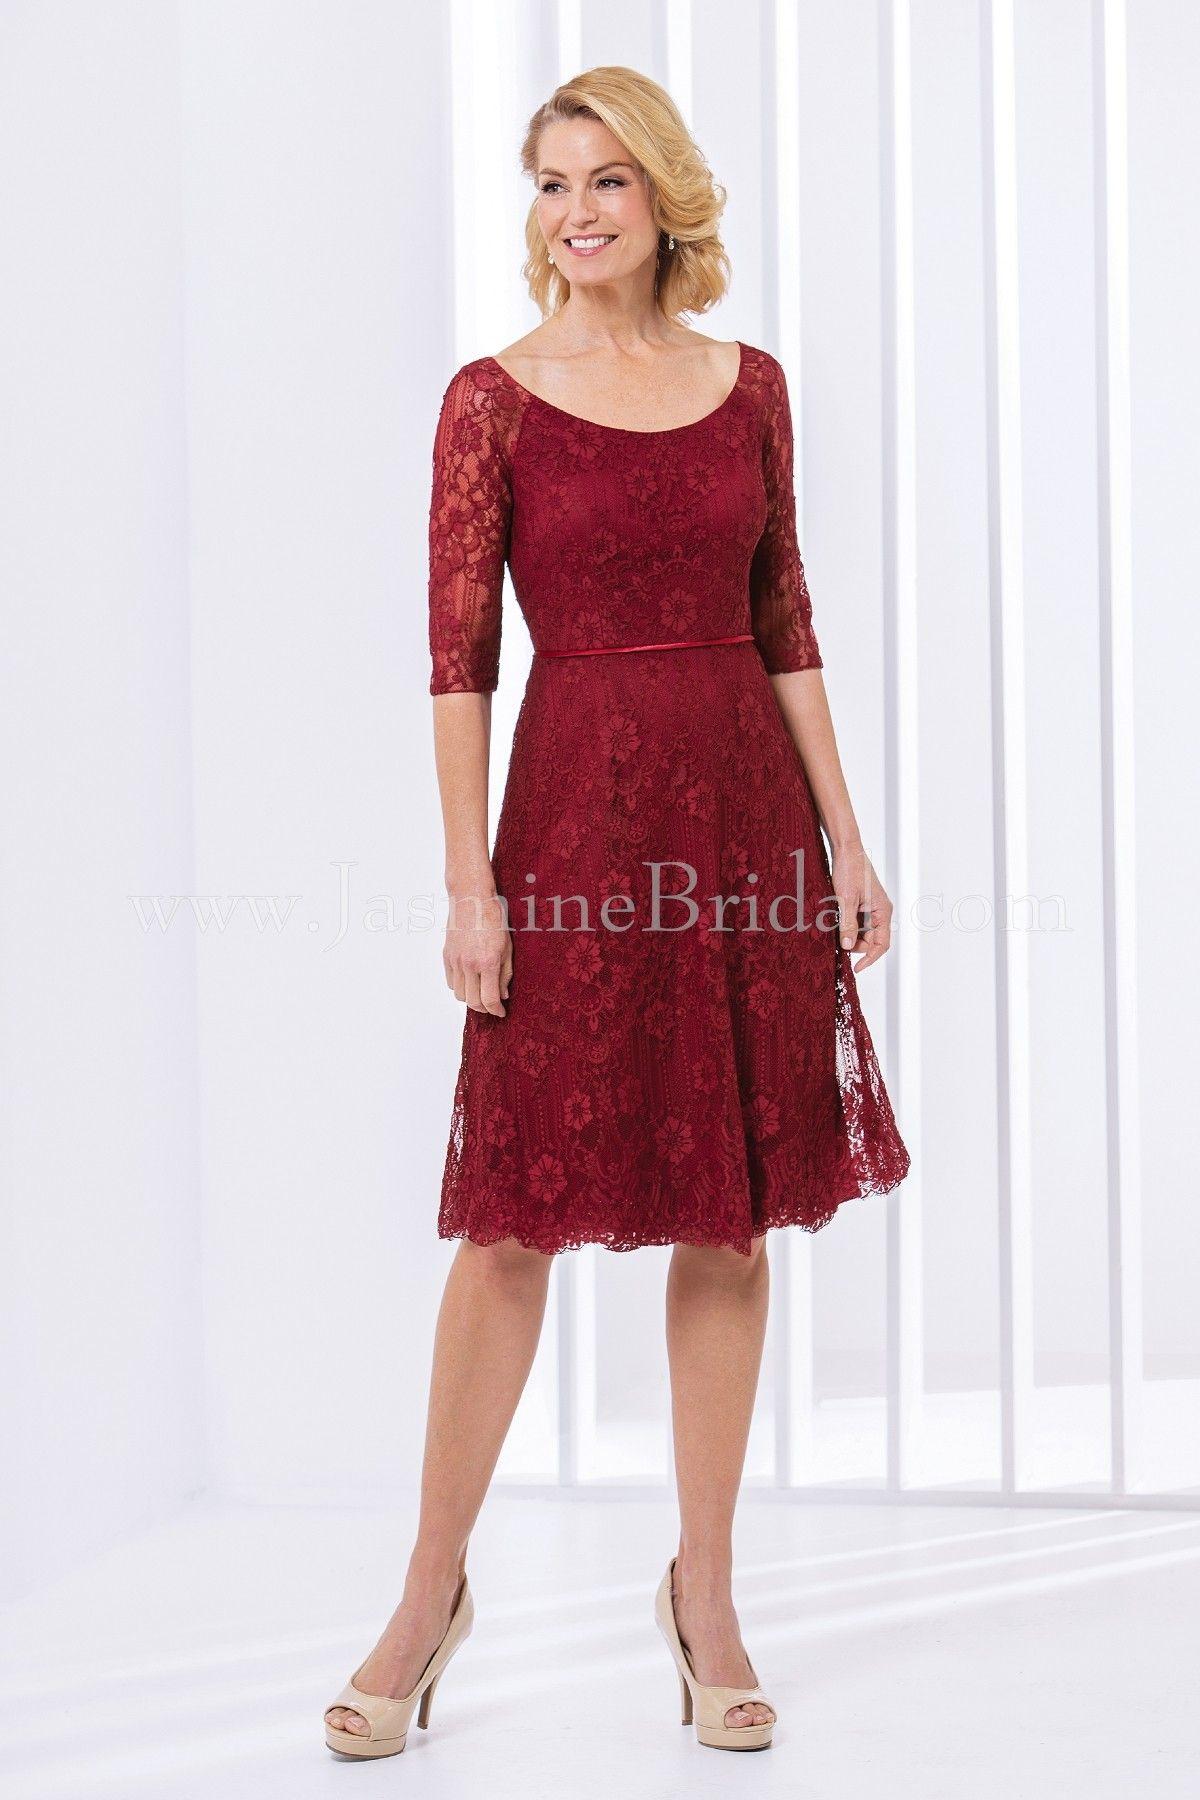 Jasmine Bridal Black Label Style M180056 In Berry